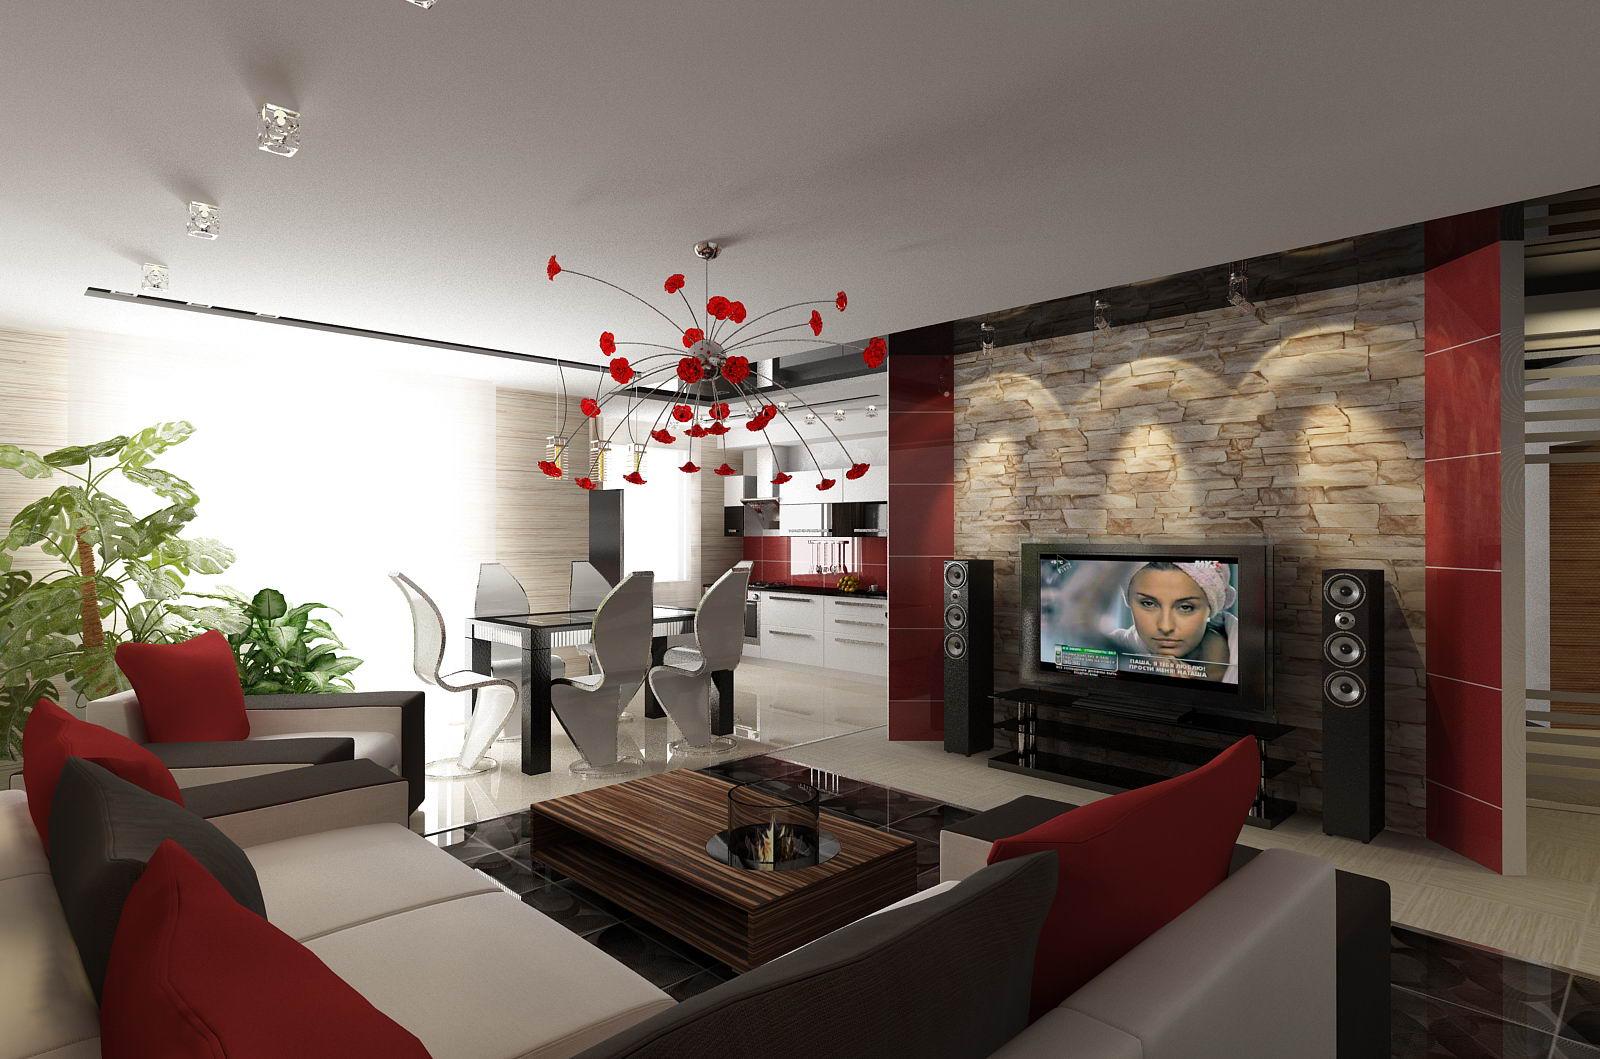 Дизайн интерьера квартир фото гостиная